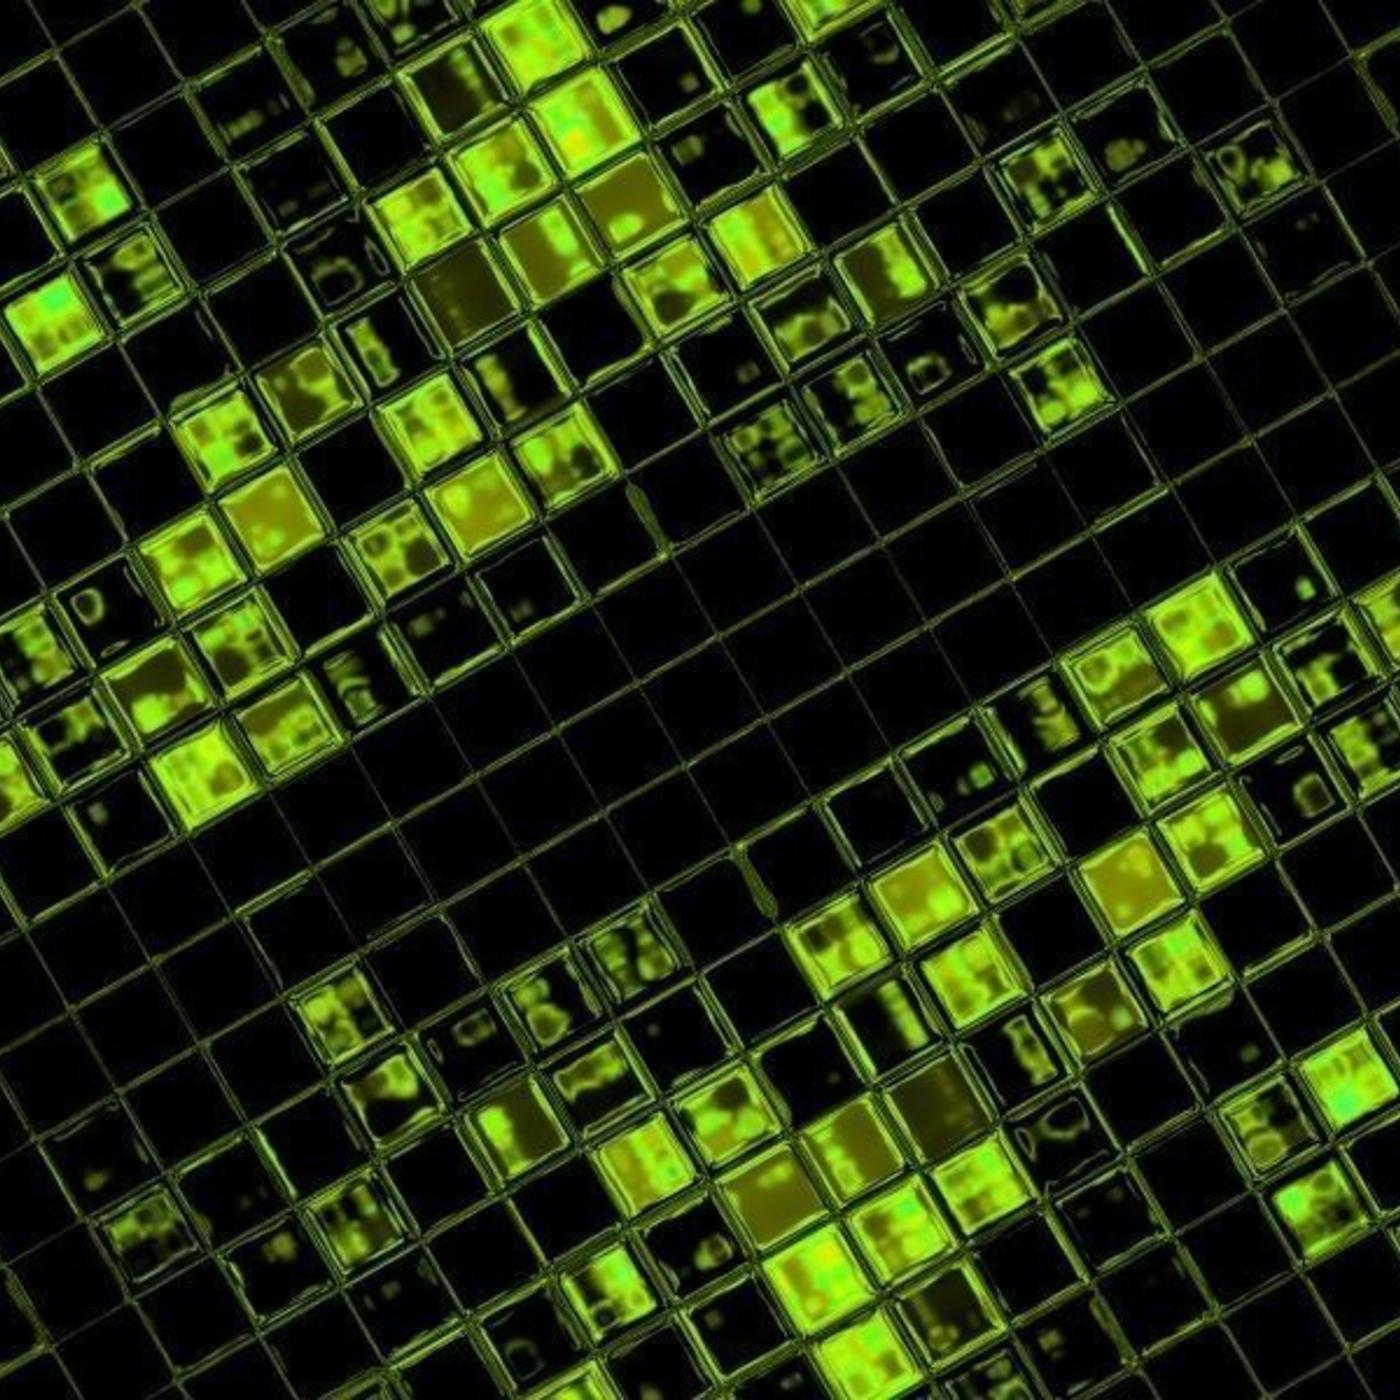 Techno, electronic, alien, binary, system